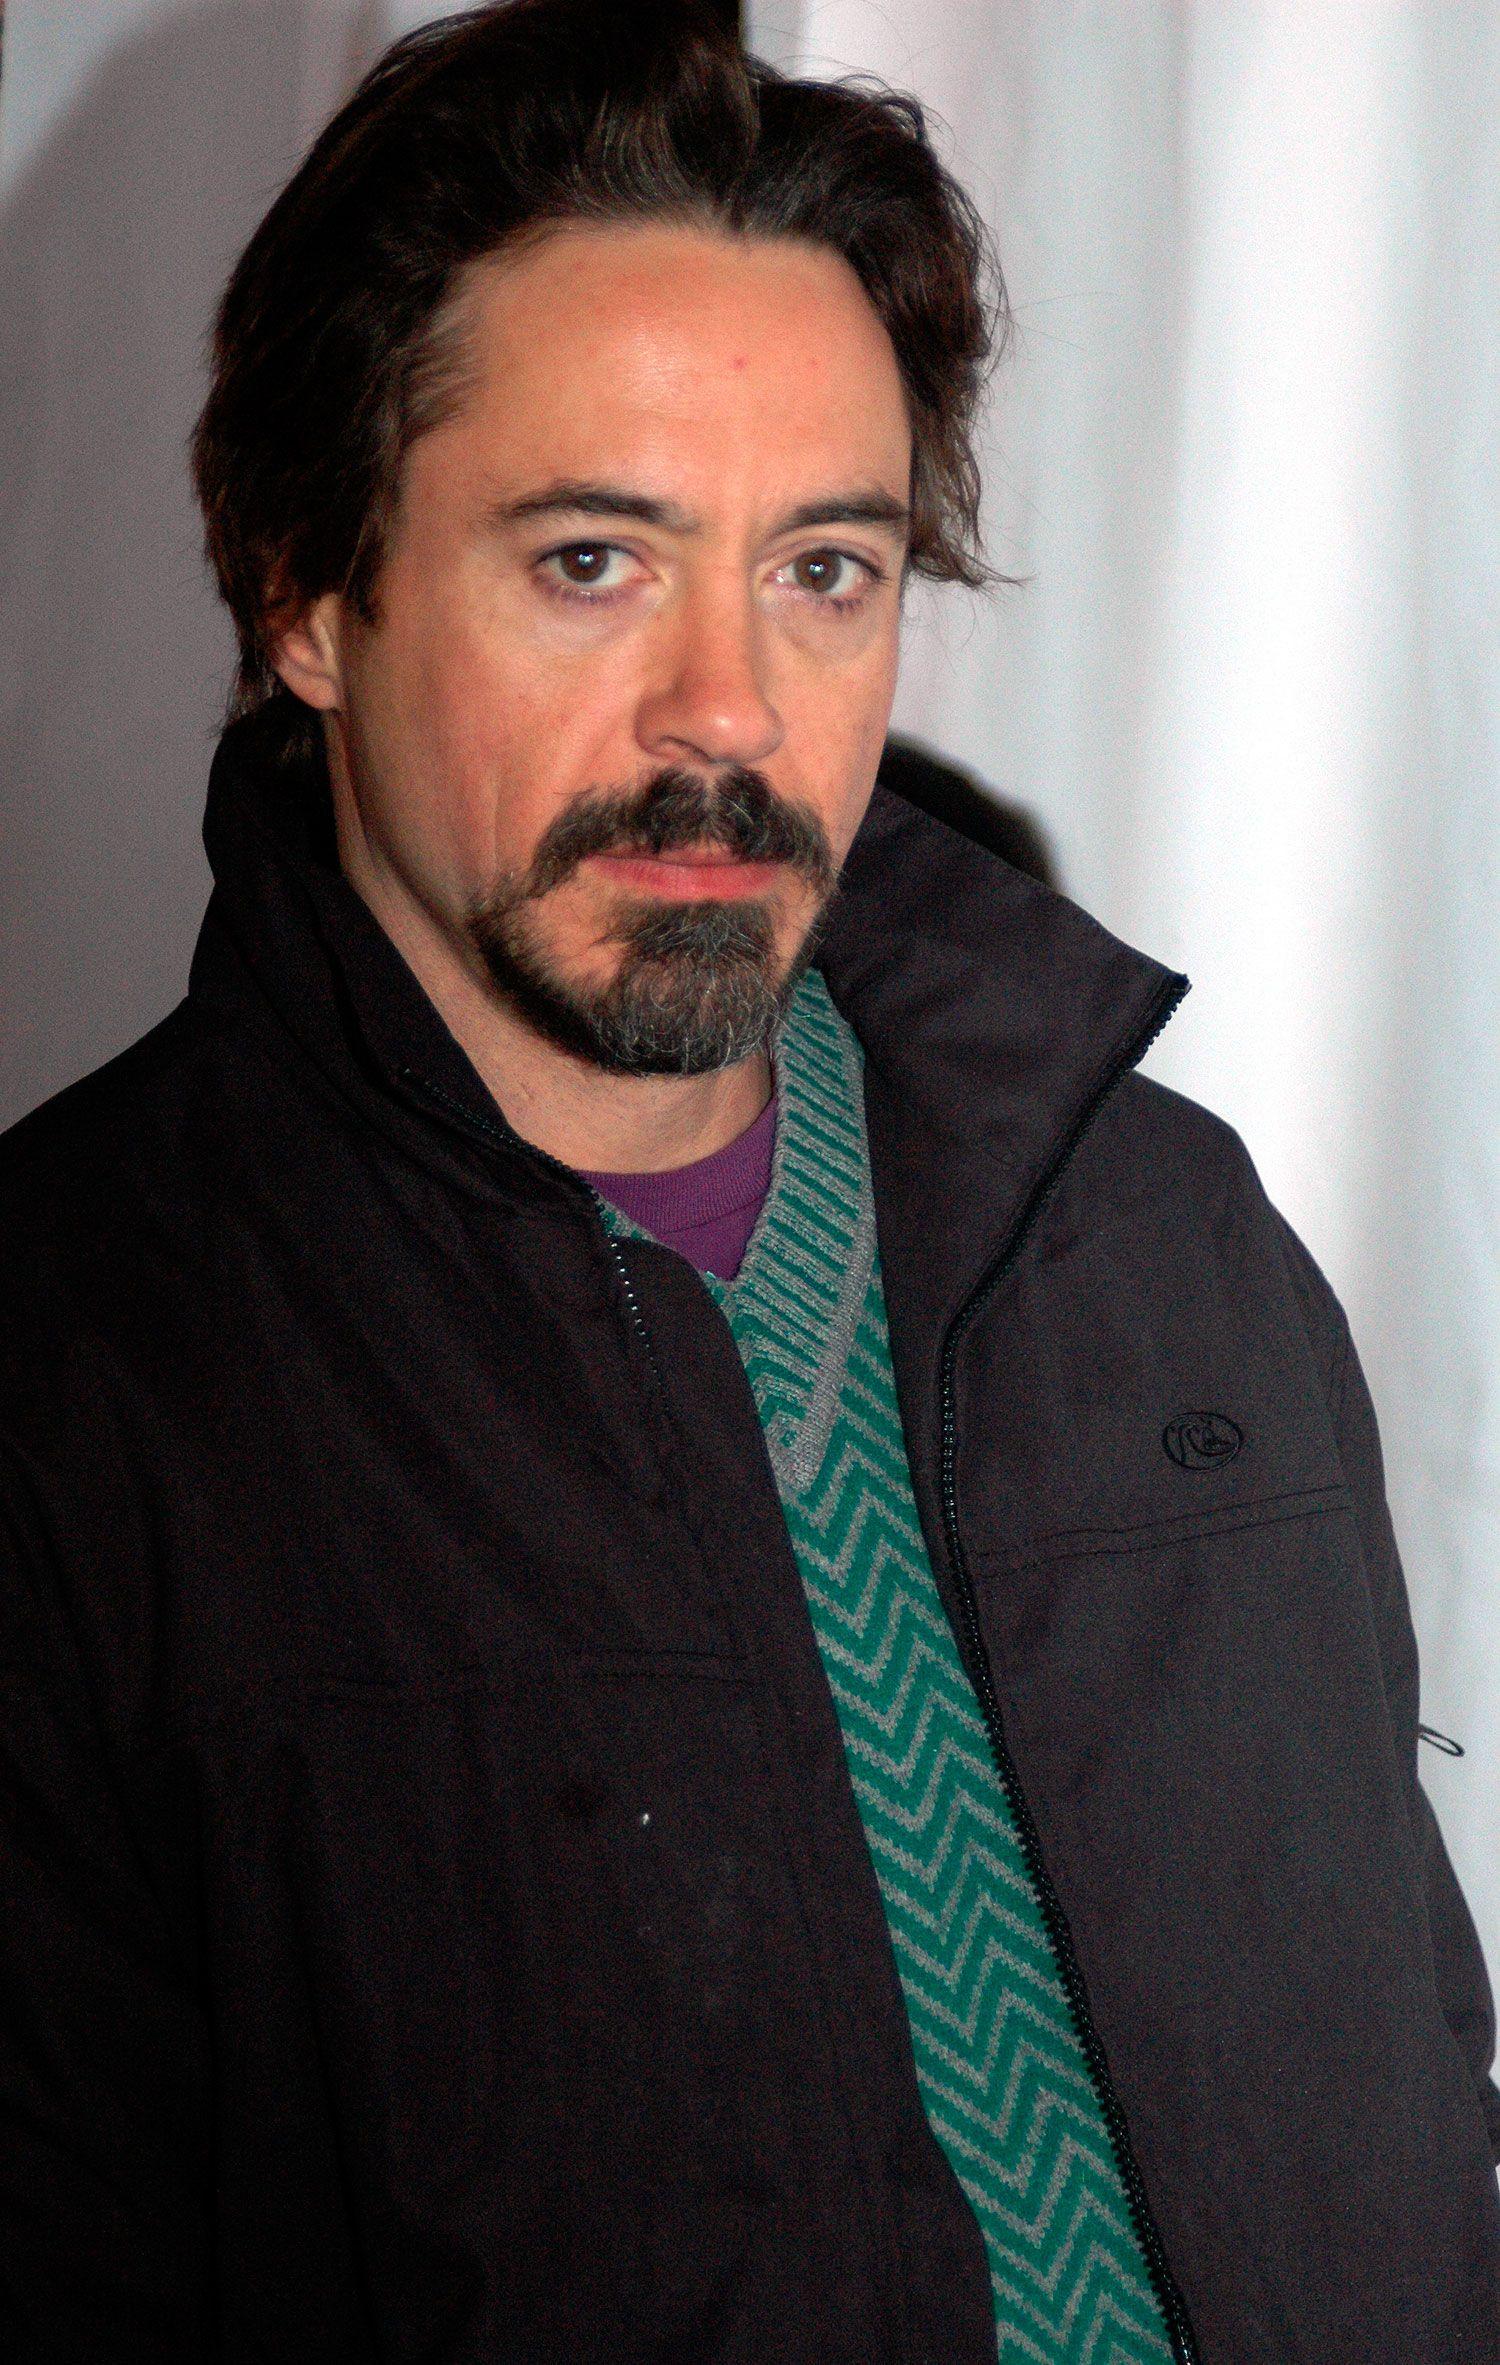 Las mejores frases de Robert Downey Jr